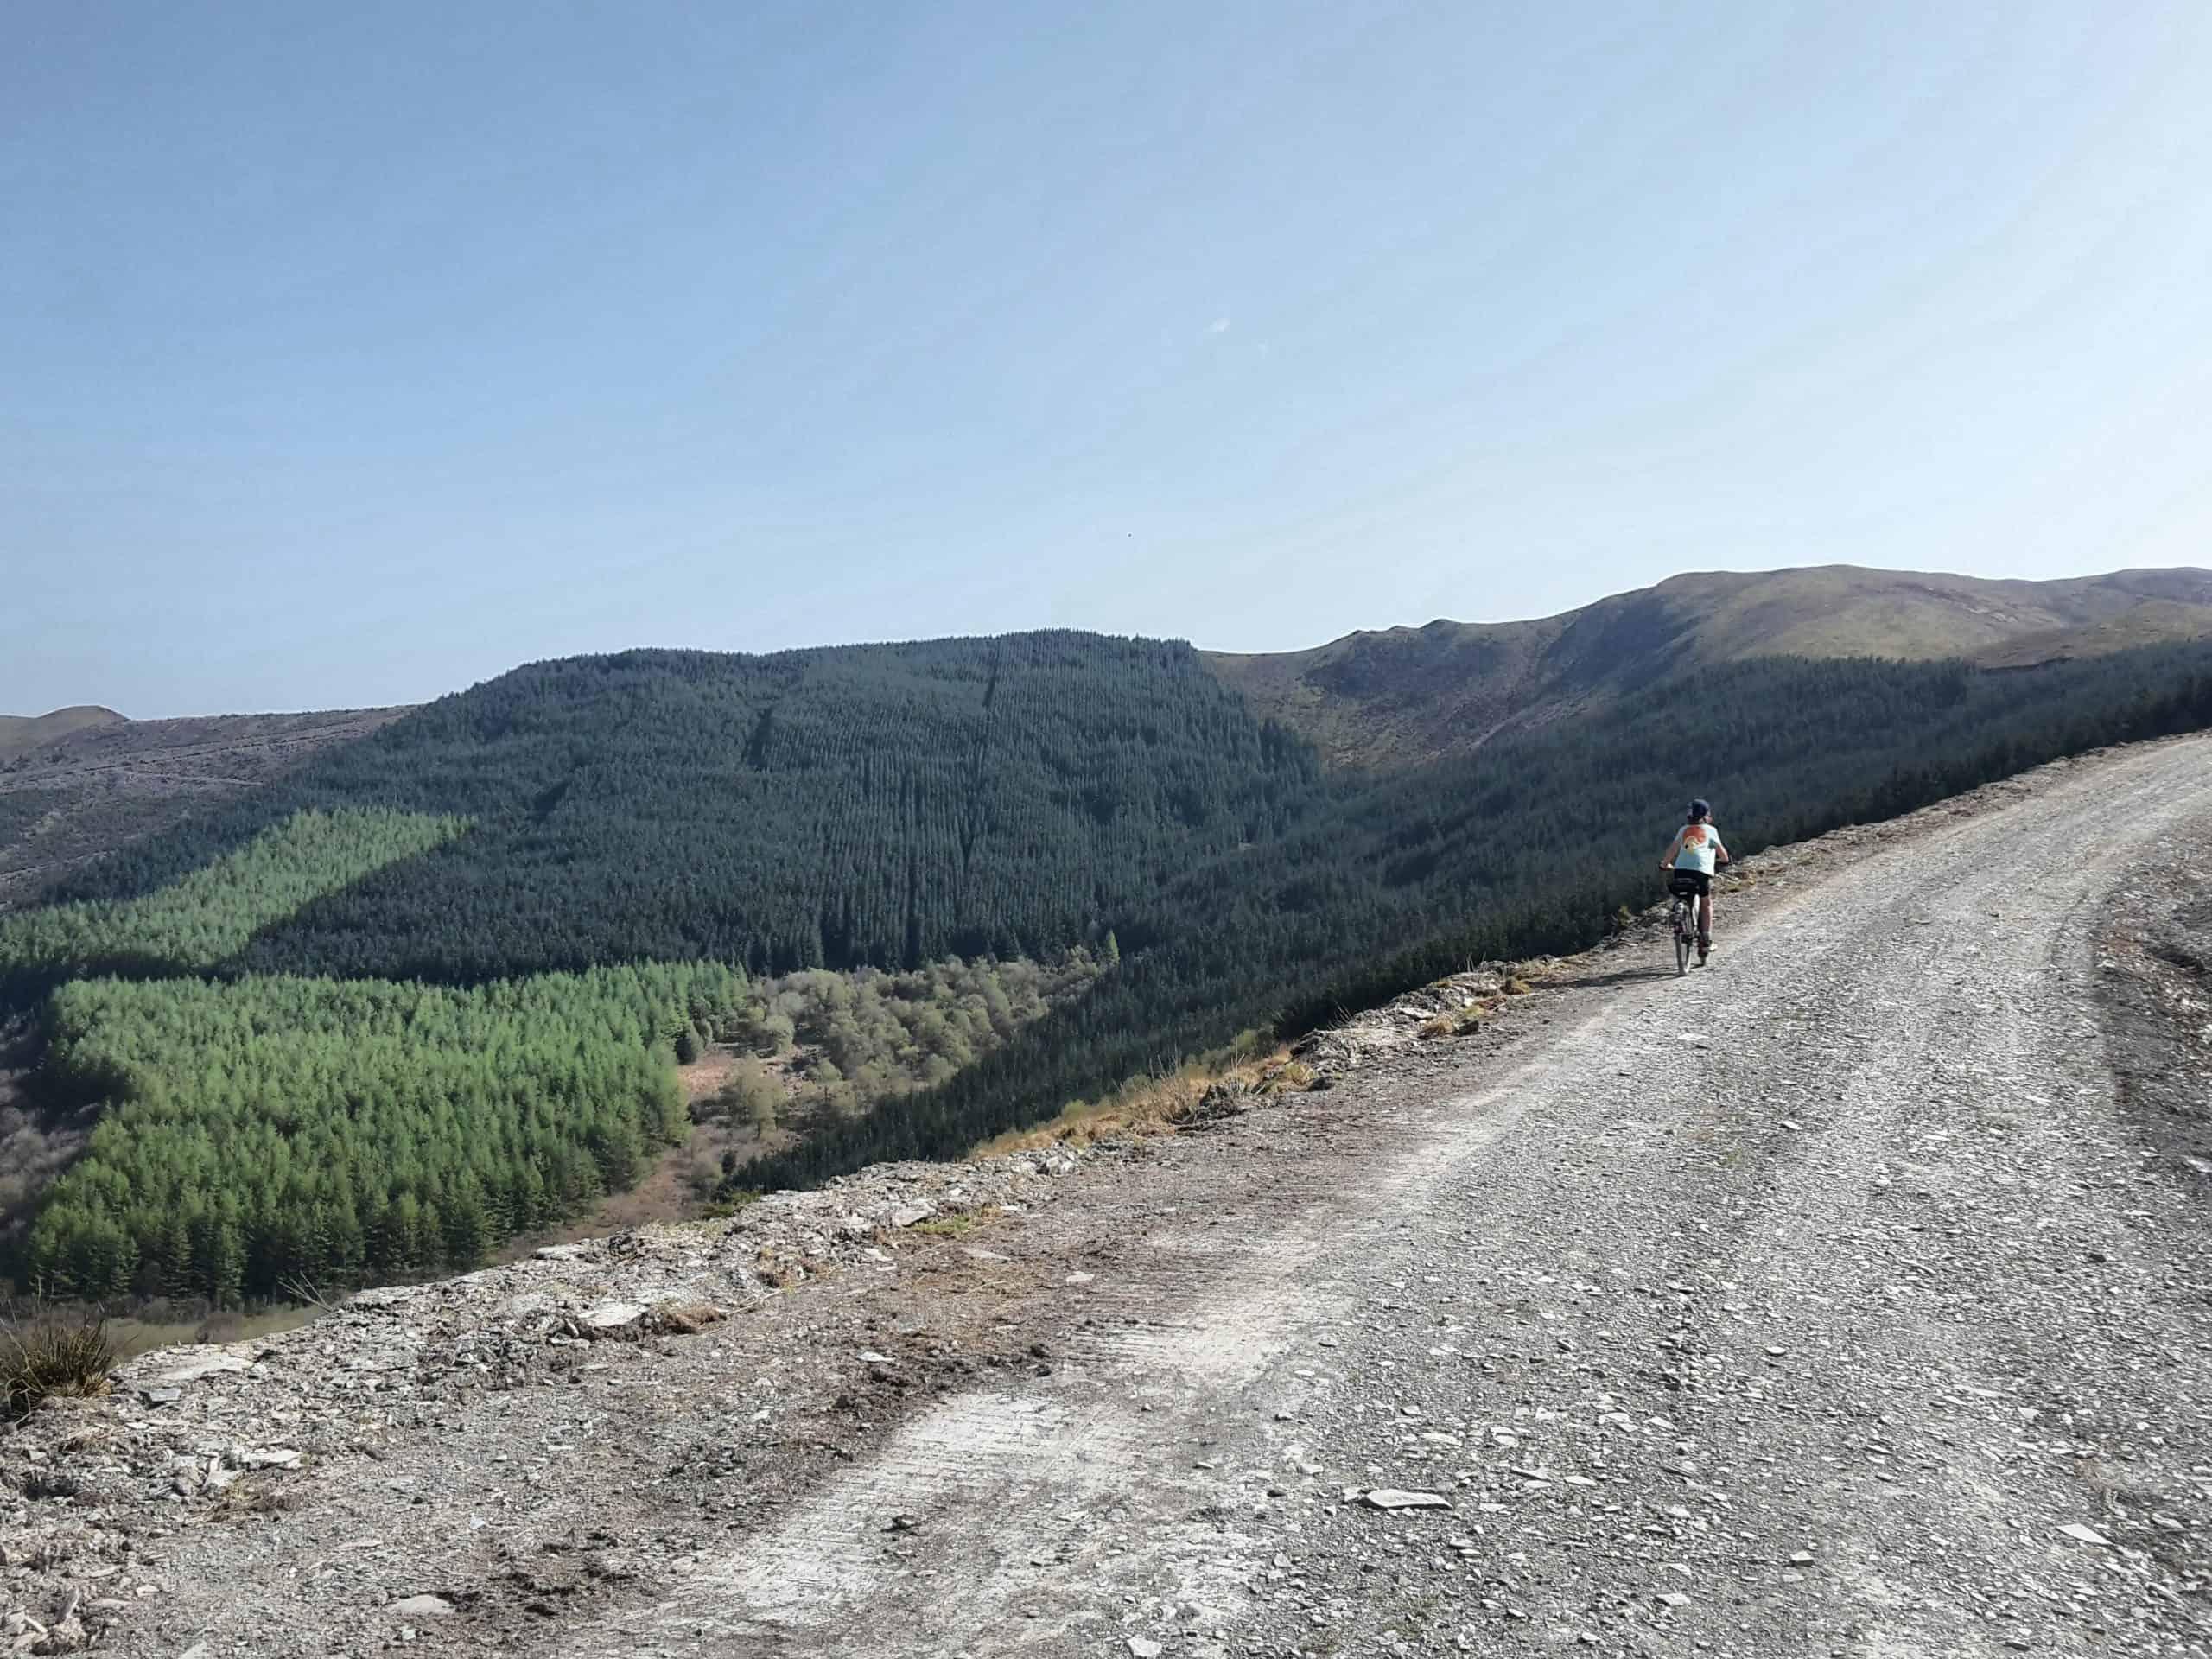 Snowdonia: Climbing Up, Riding Back 83